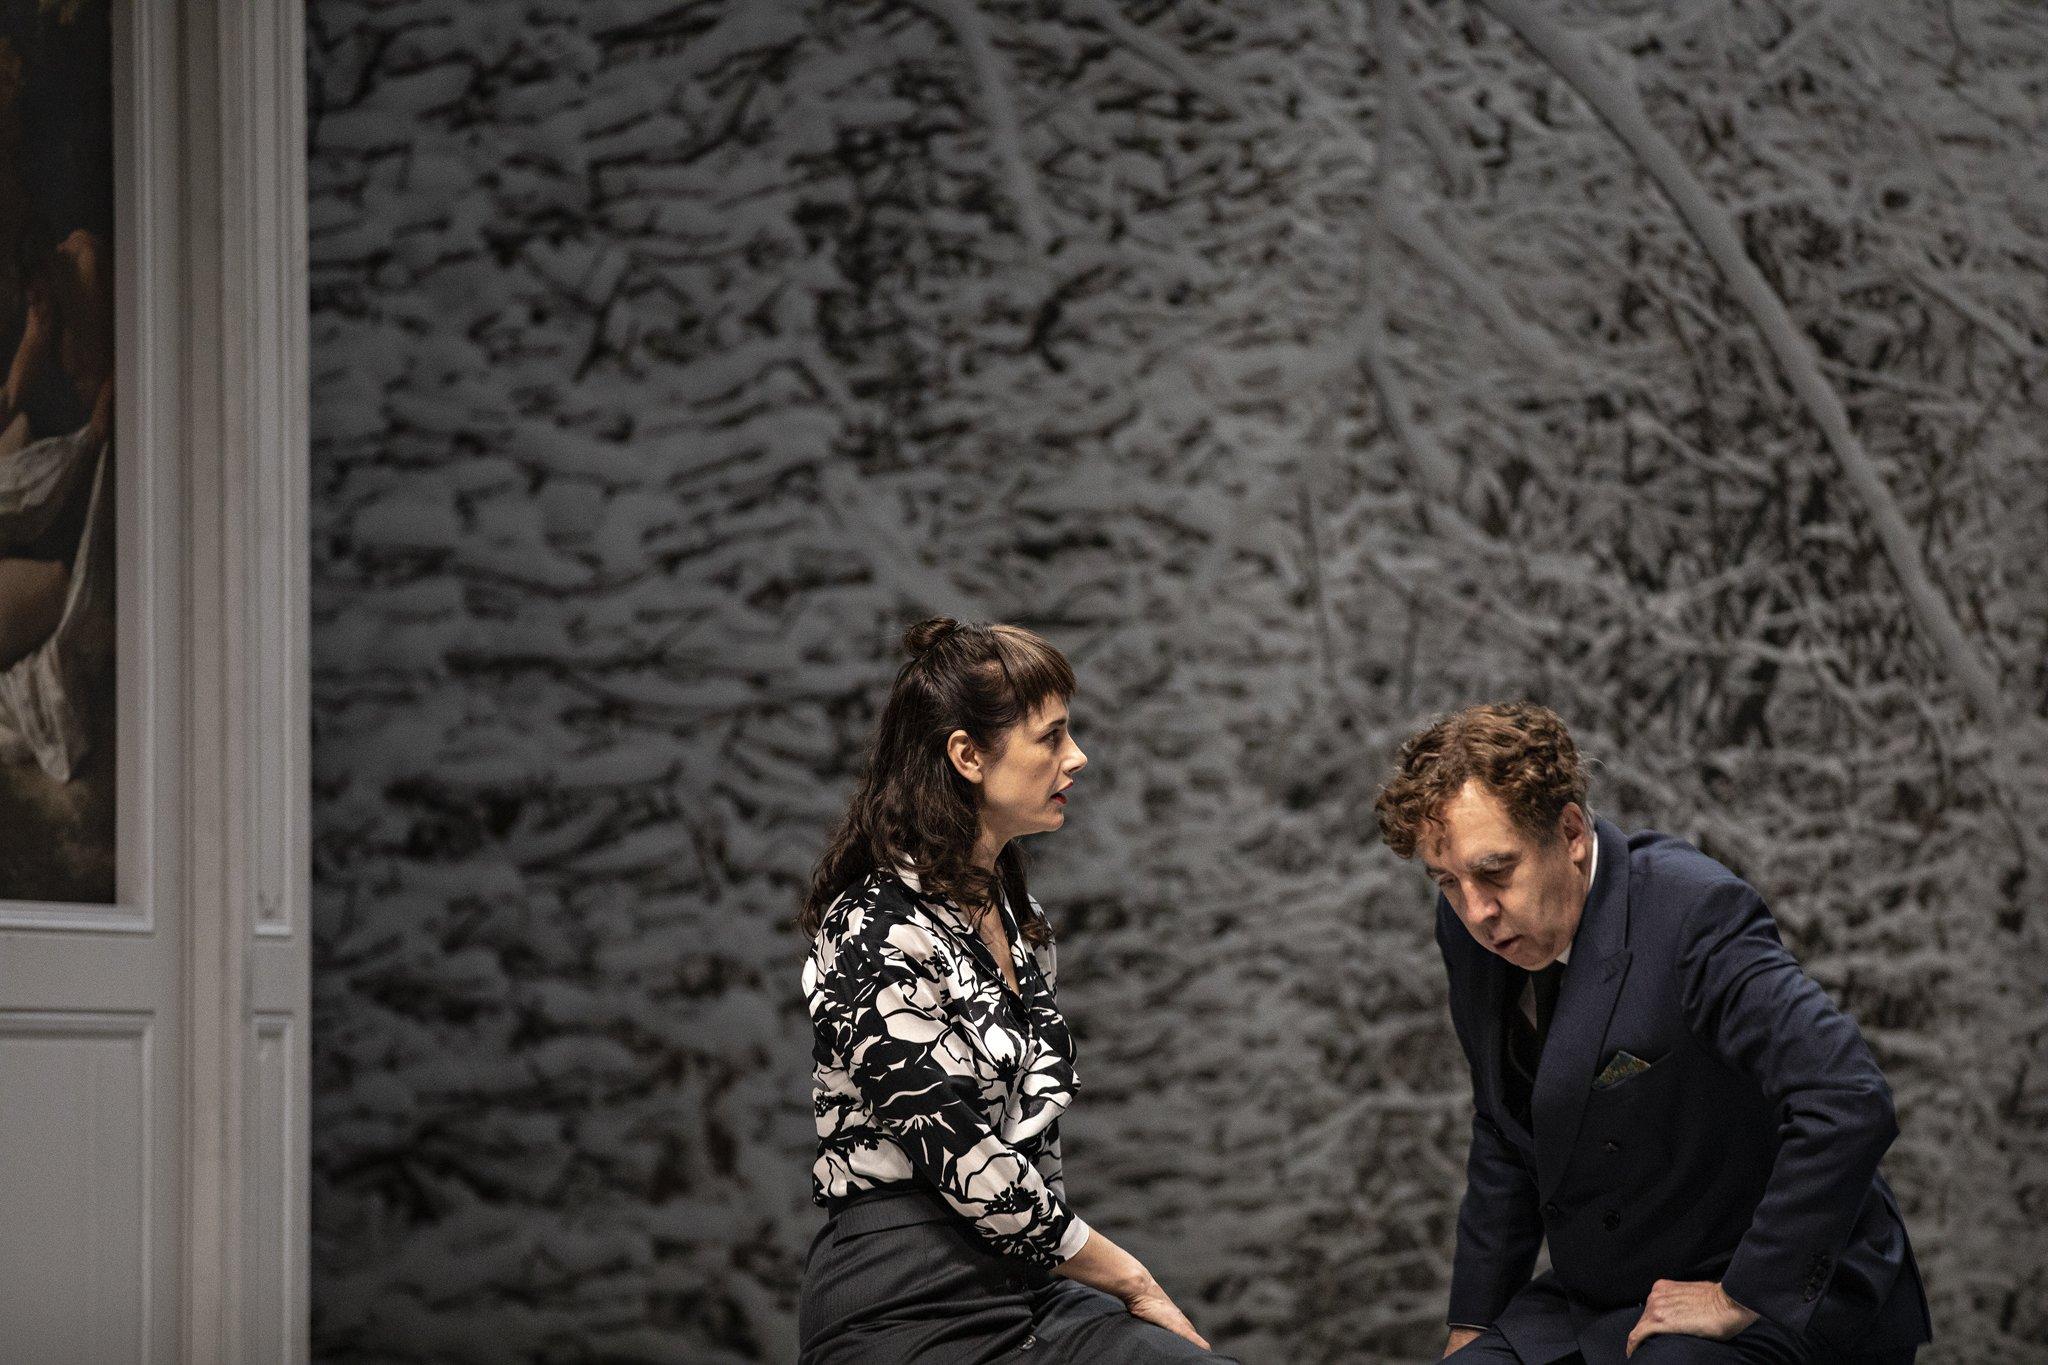 Theatre_le misanthrope_TNS Strasbourg_c_jean louis fernandez_szenik